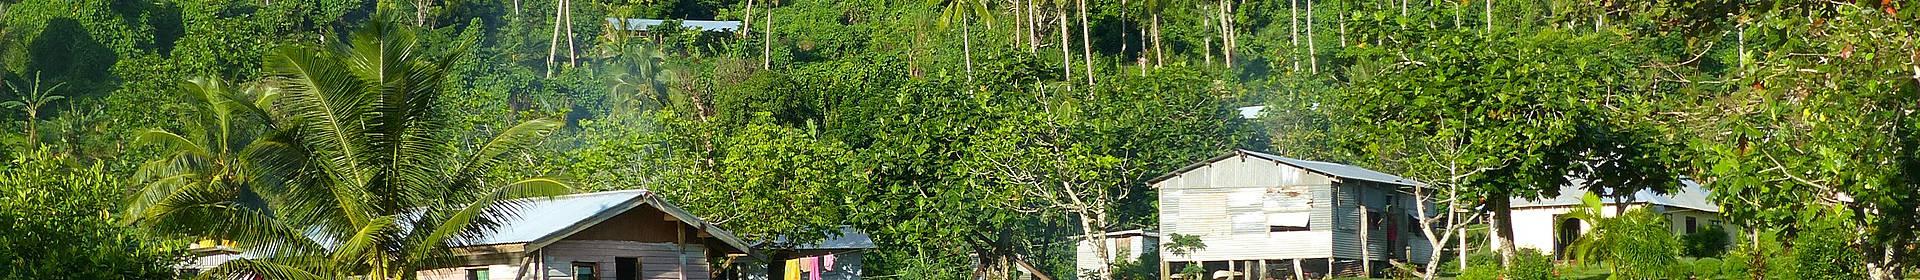 Nggamea Island